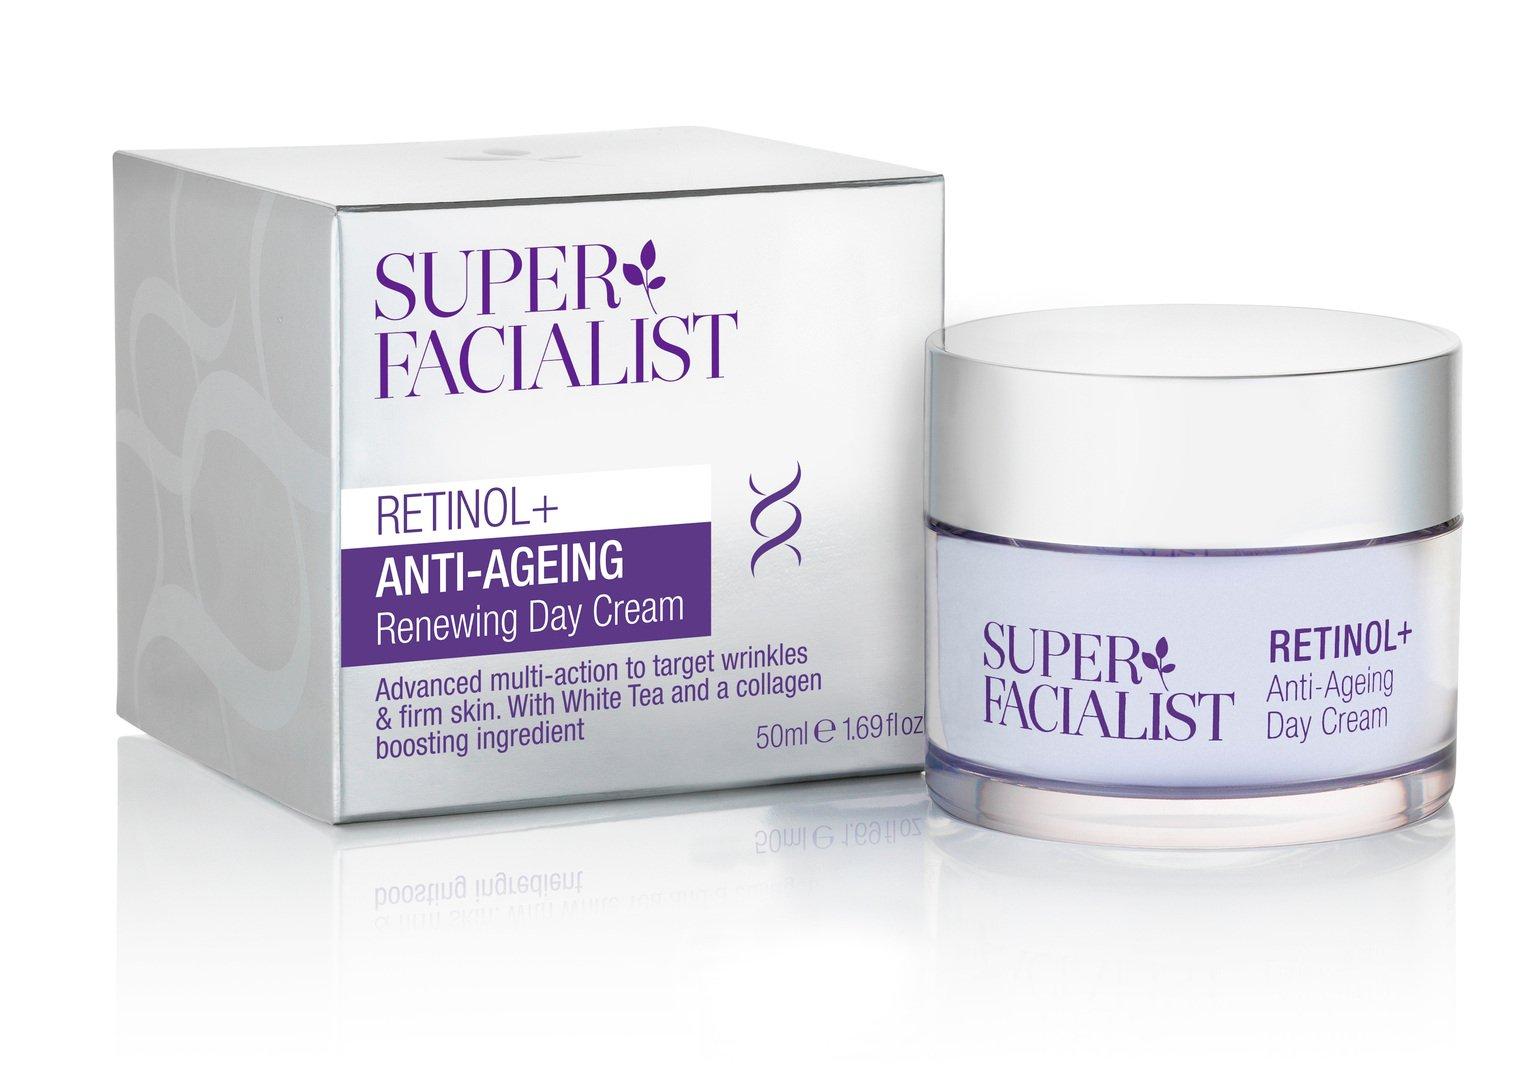 Super Facialist Retinol Anti-Ageing Day Cream 50ml